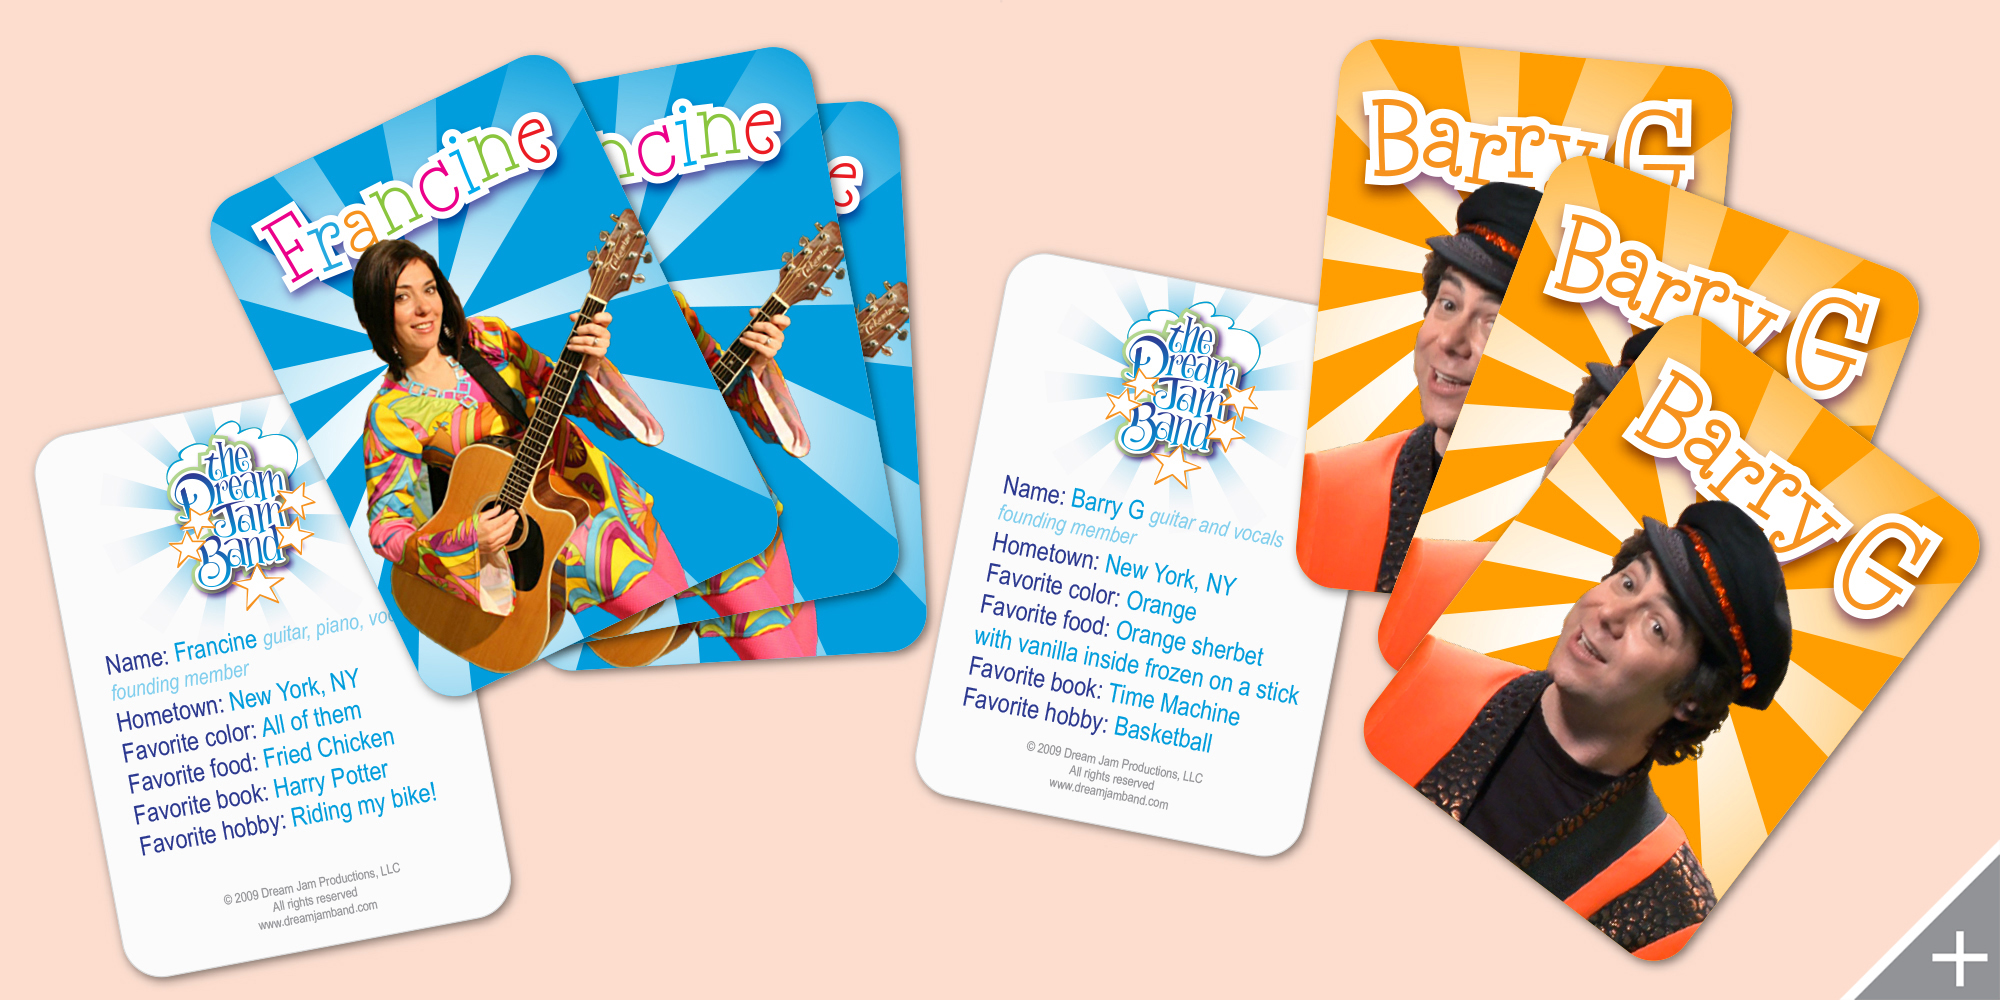 PRINT DESIGN/MERCHANDISE DESIGN - The Dream Jam Band   Trading Cards - ©UnParalleled, LLC dba UP-Ideas / Roger Sawhill / Mark Braught - Atlanta, Georgia   Lawrenceville, Georgia   Commerce, Georgia